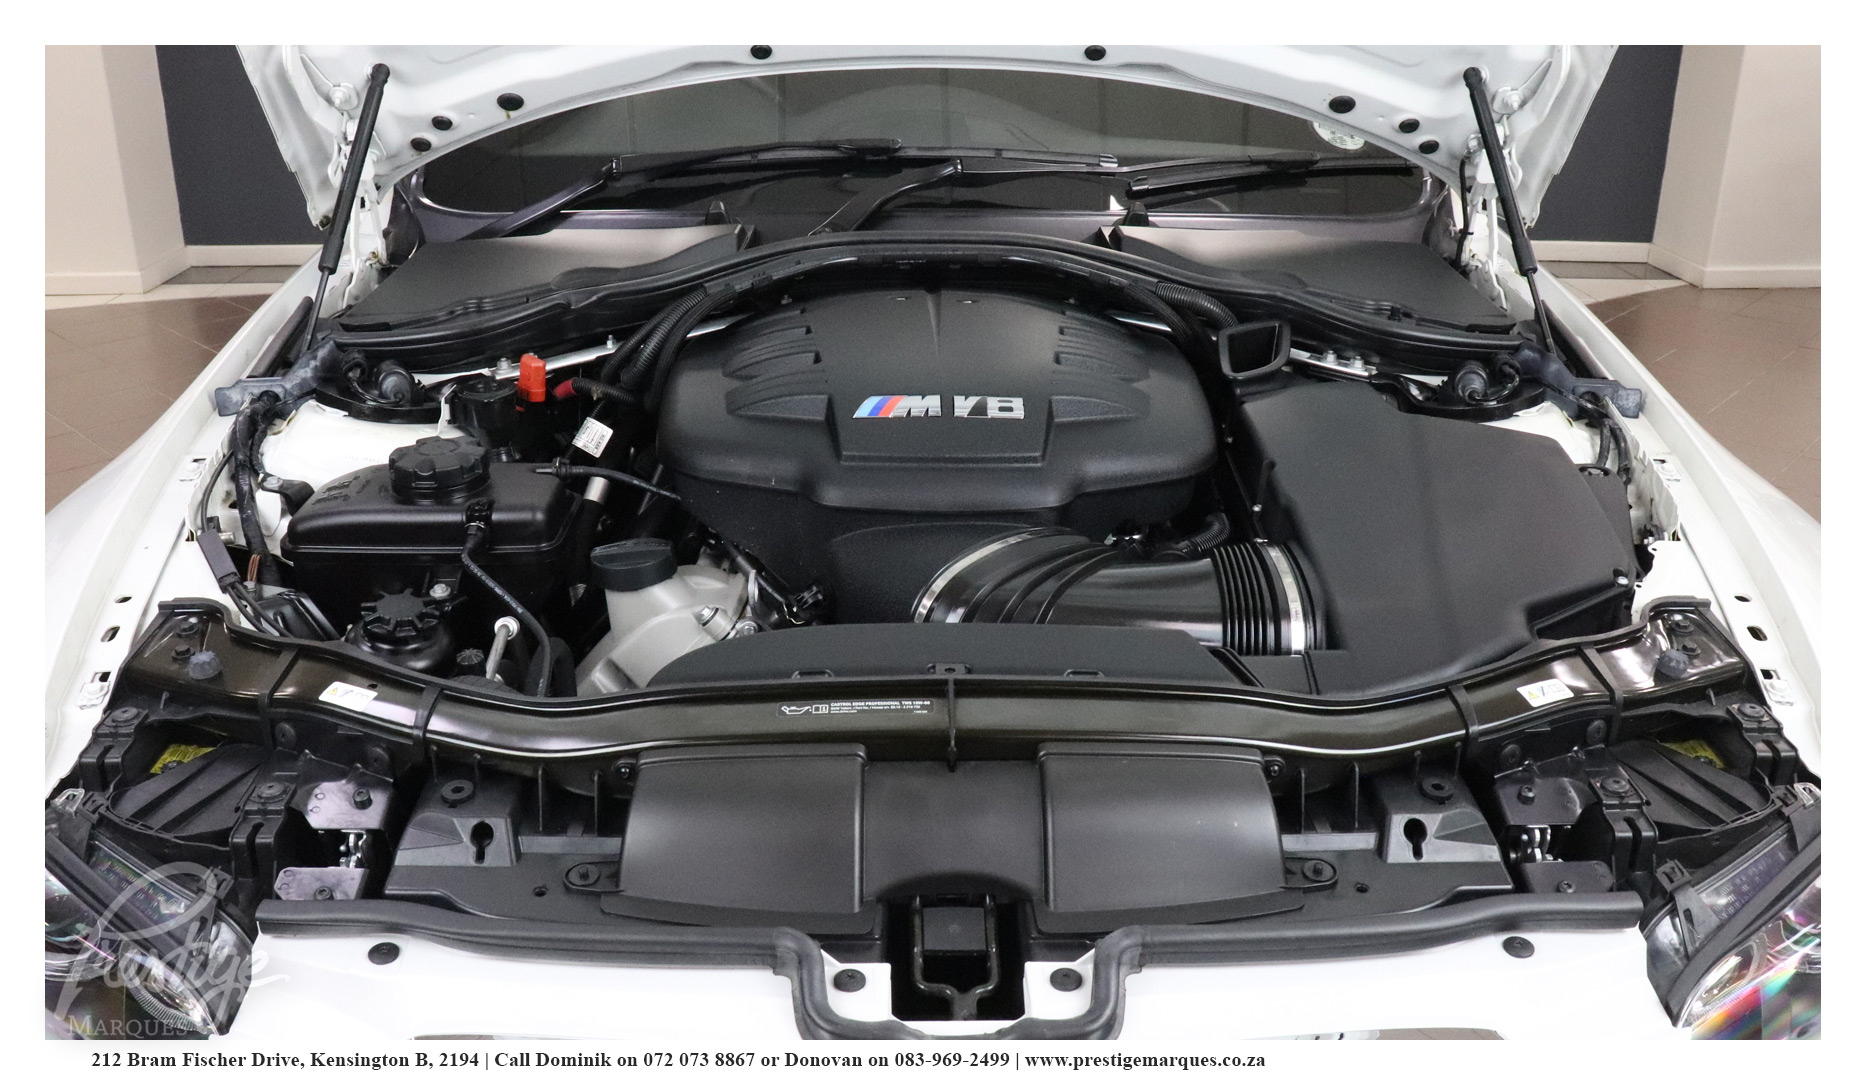 2013-BMW-M3-Competition Package-MDCT-Prestige-Marques-Randburg-Sandton-9